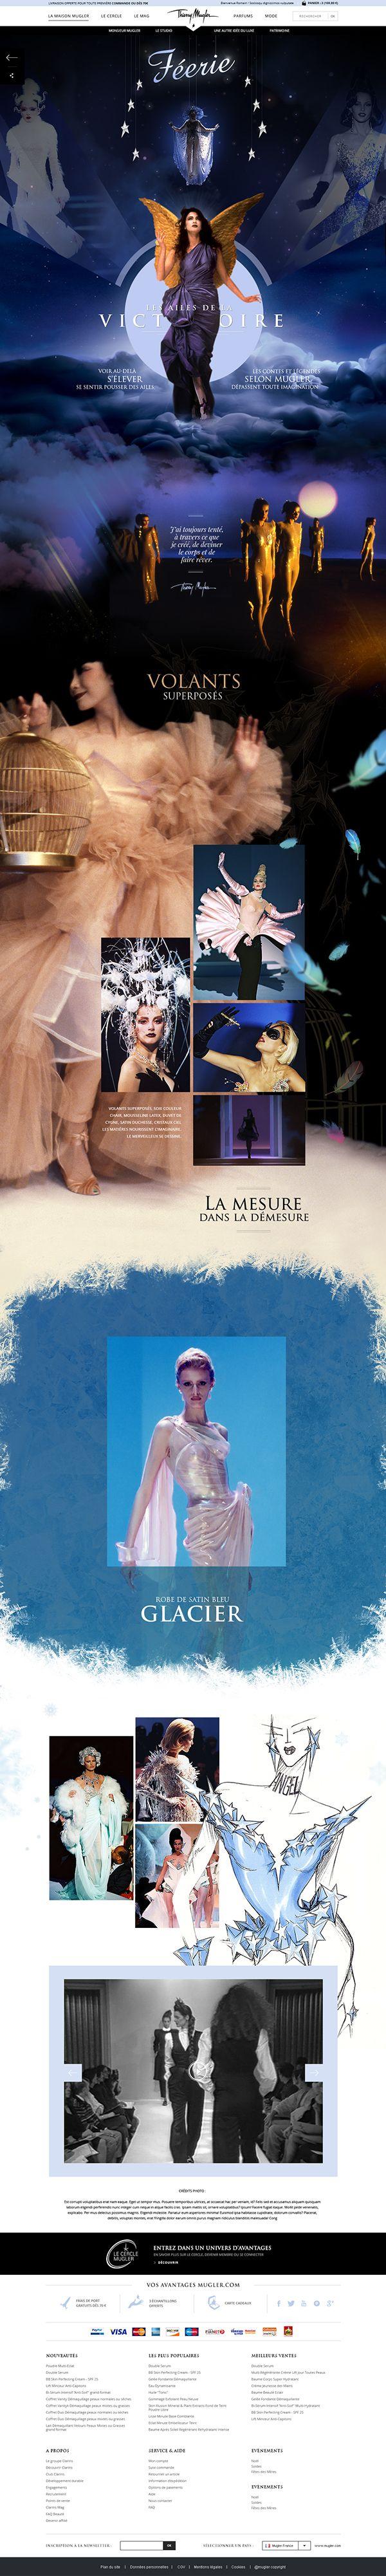 Thierry Mugler Heritage. #WebDesign #Design #Fashion